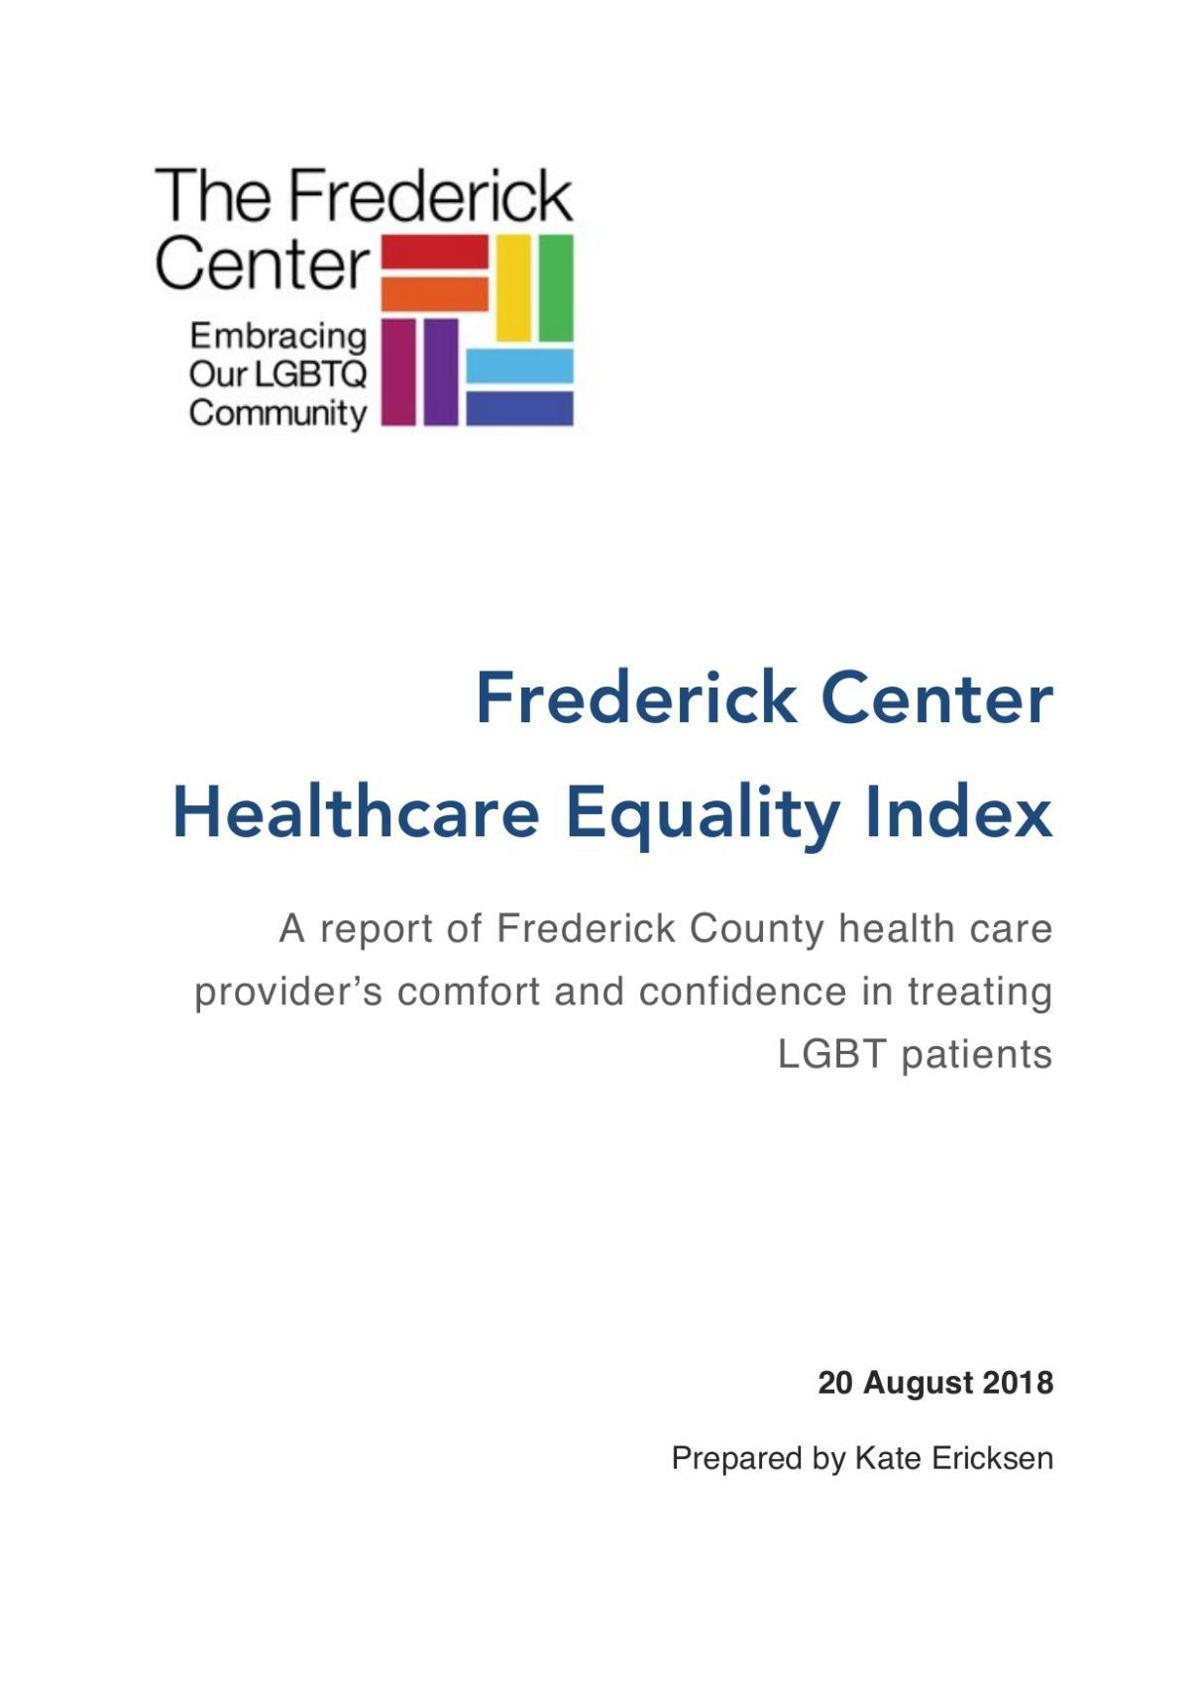 Frederick Center survey